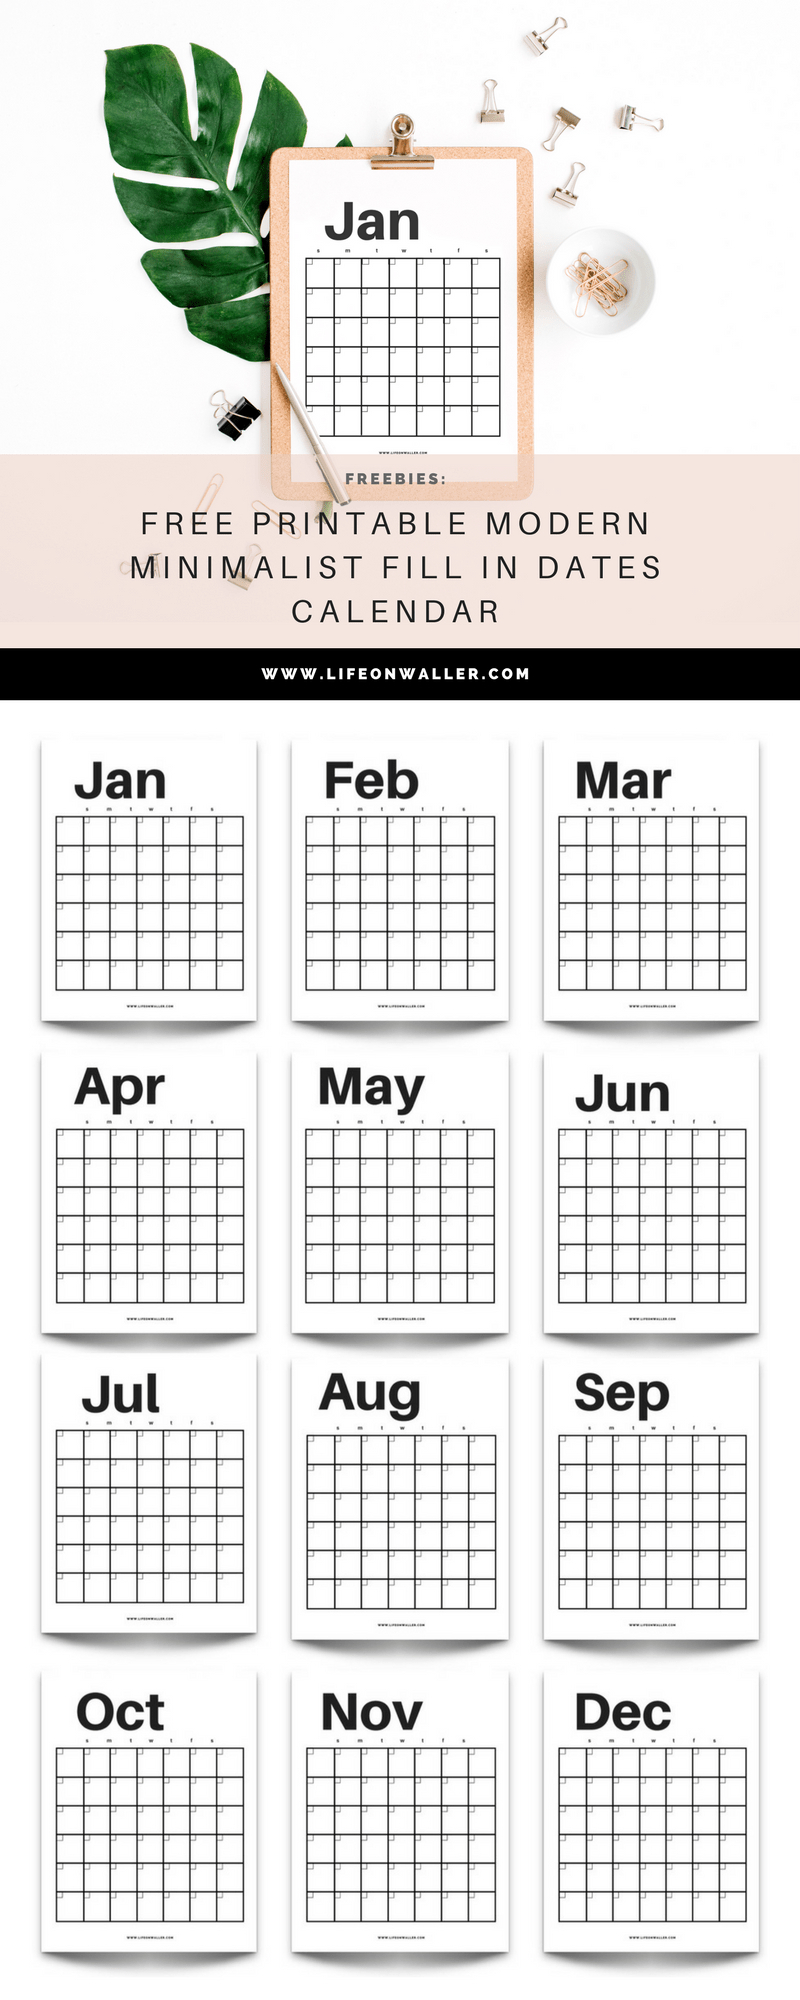 Free Fill In Printable Calendar | Calendar Printables Free Printable Fill In Schedule